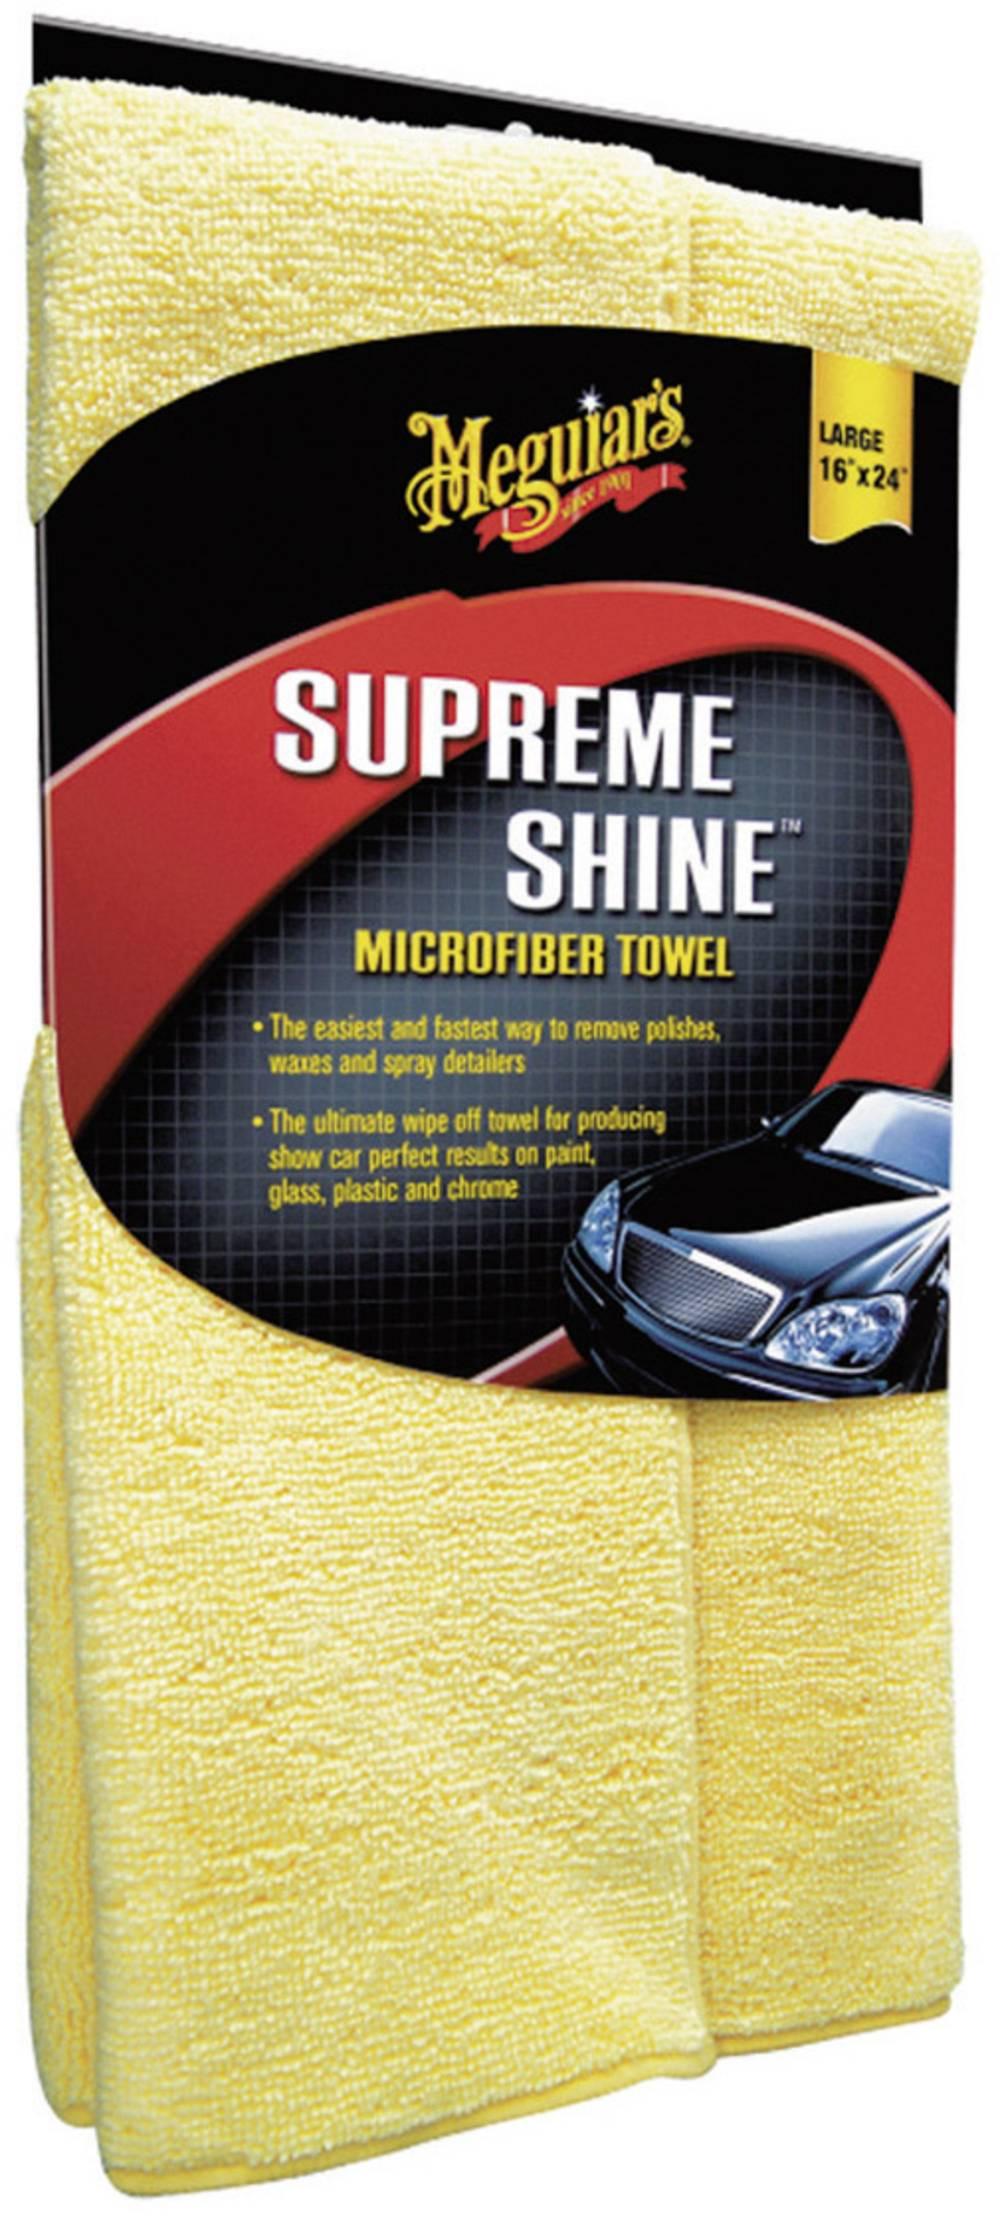 Meguiars x2010 Supreme Shine Microfiber Drying Towel 1x